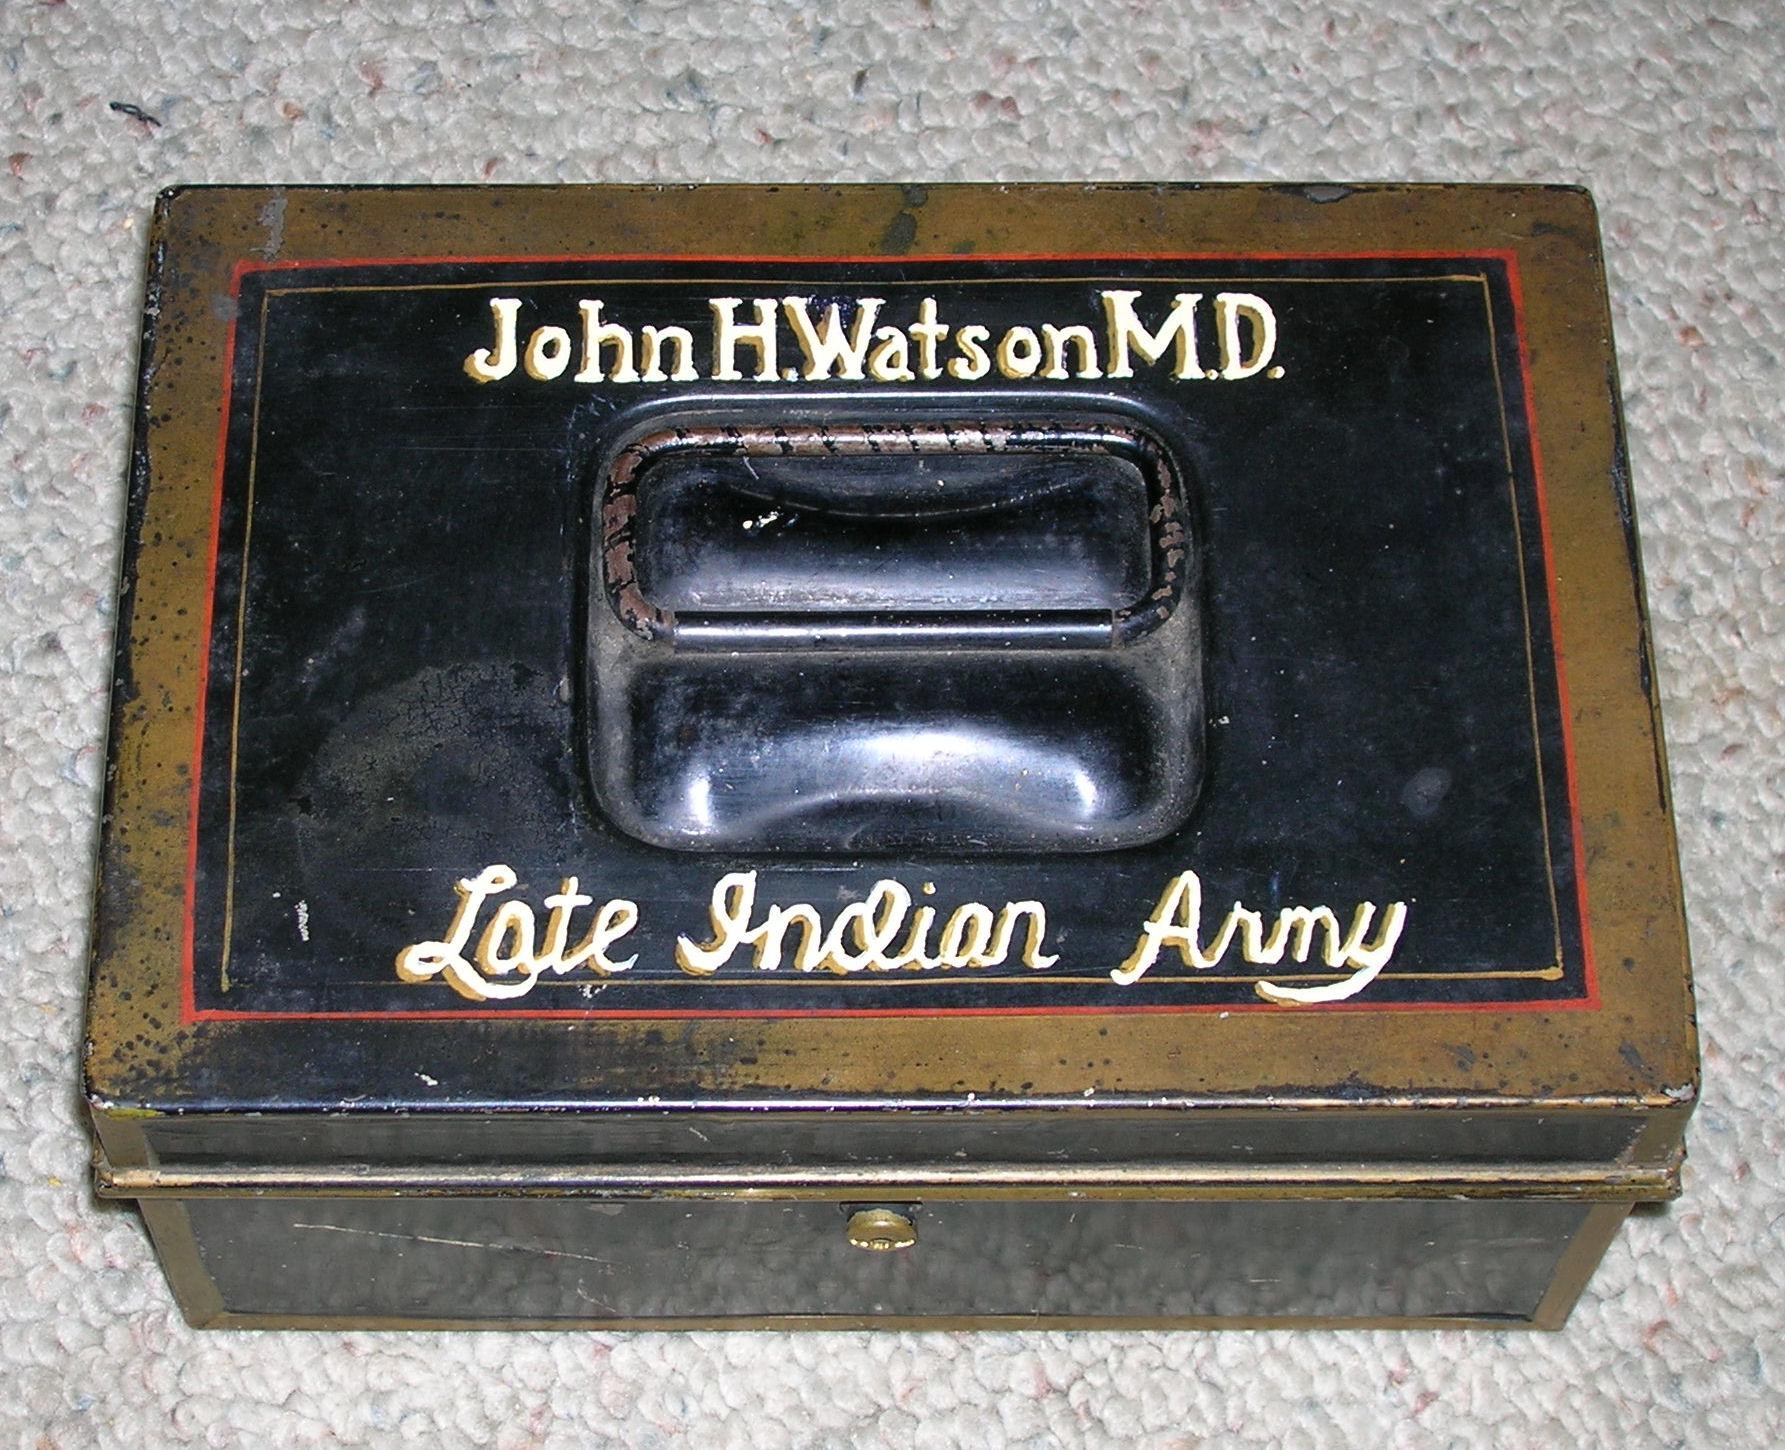 From Watson's Tin Box: The Five Orange Pips